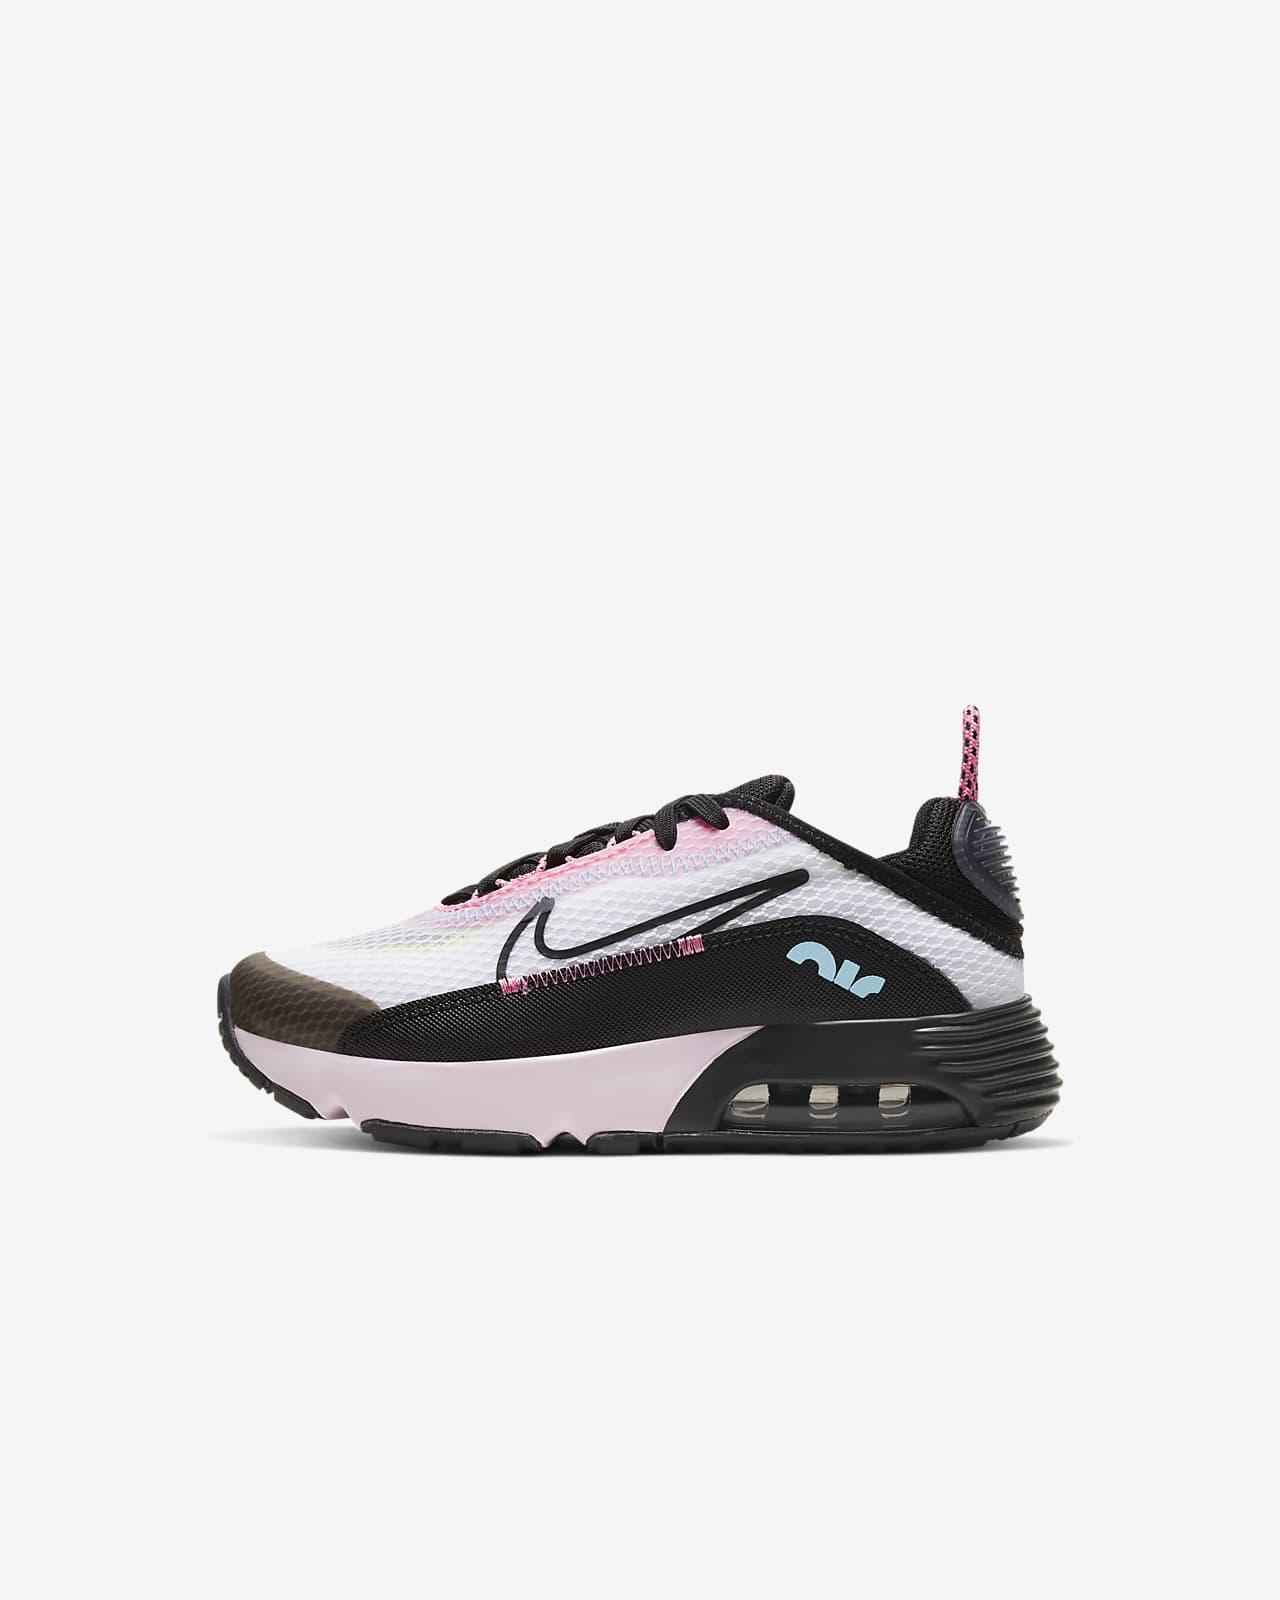 Nike Air Max 2090 sko til sped småbarn. Nike NO